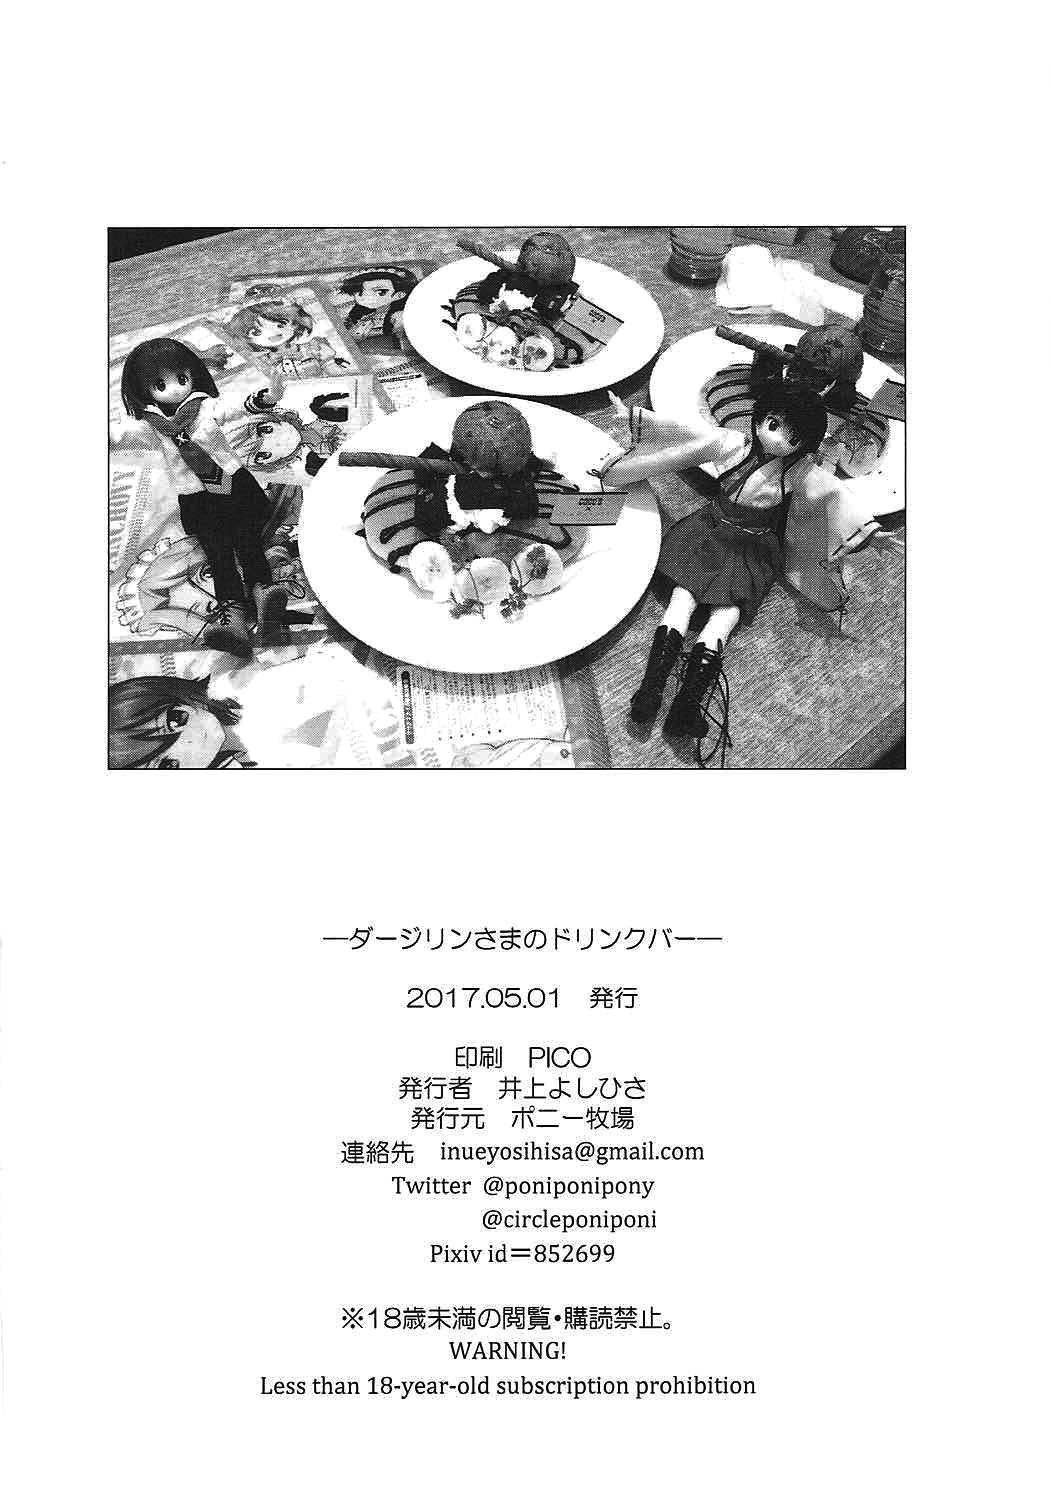 (COMIC1☆11) [Ponyfarm (Inoue Yoshihisa)] Darjeeling-sama no Drink Bar | Darjeeling-sama's Drink Bar (Girls und Panzer) [English] [CrowKarasu] 20